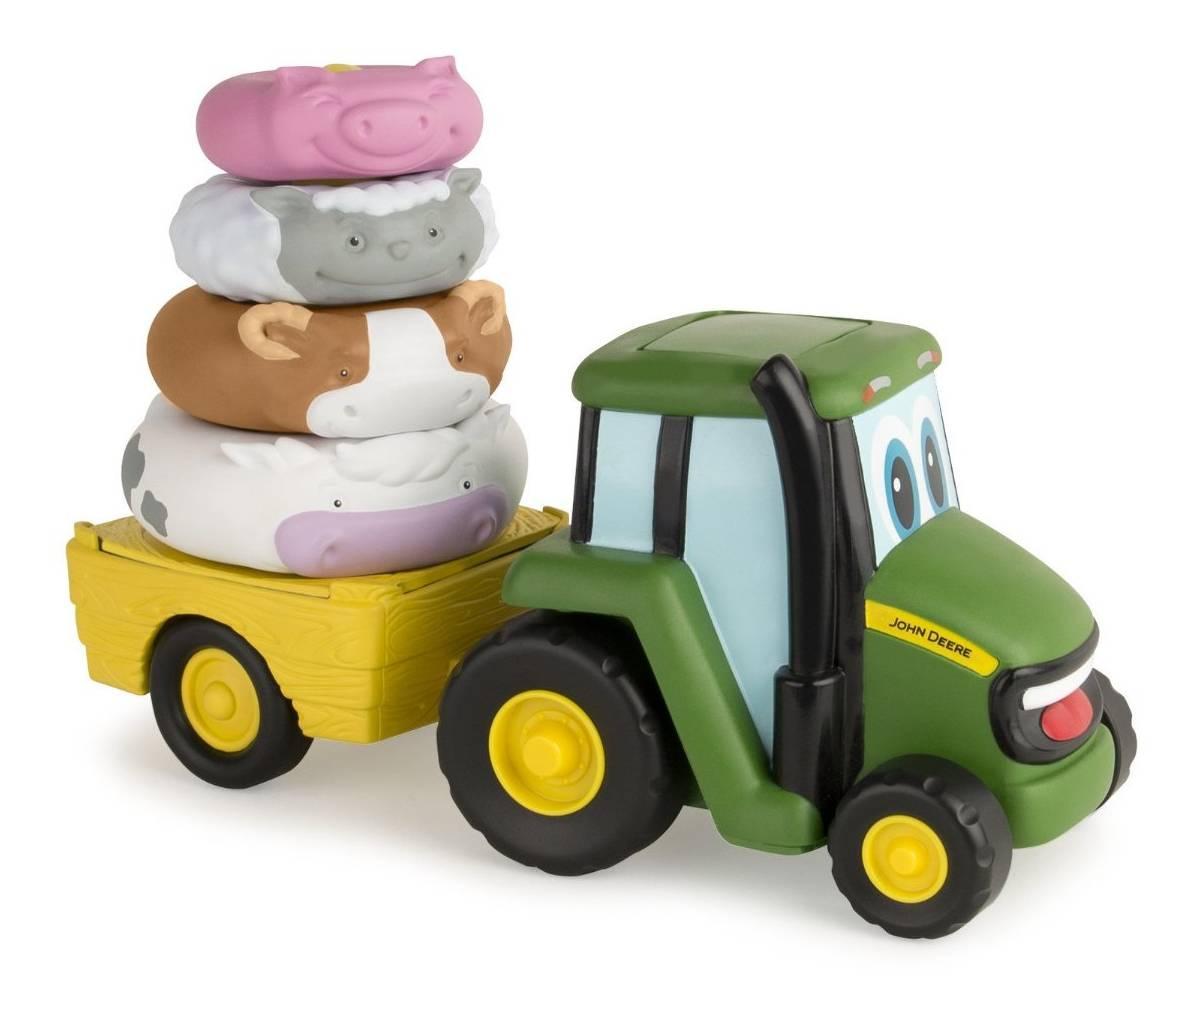 Britains Tomy John Deere Farm Stackers 46403 - Farm Toys Online